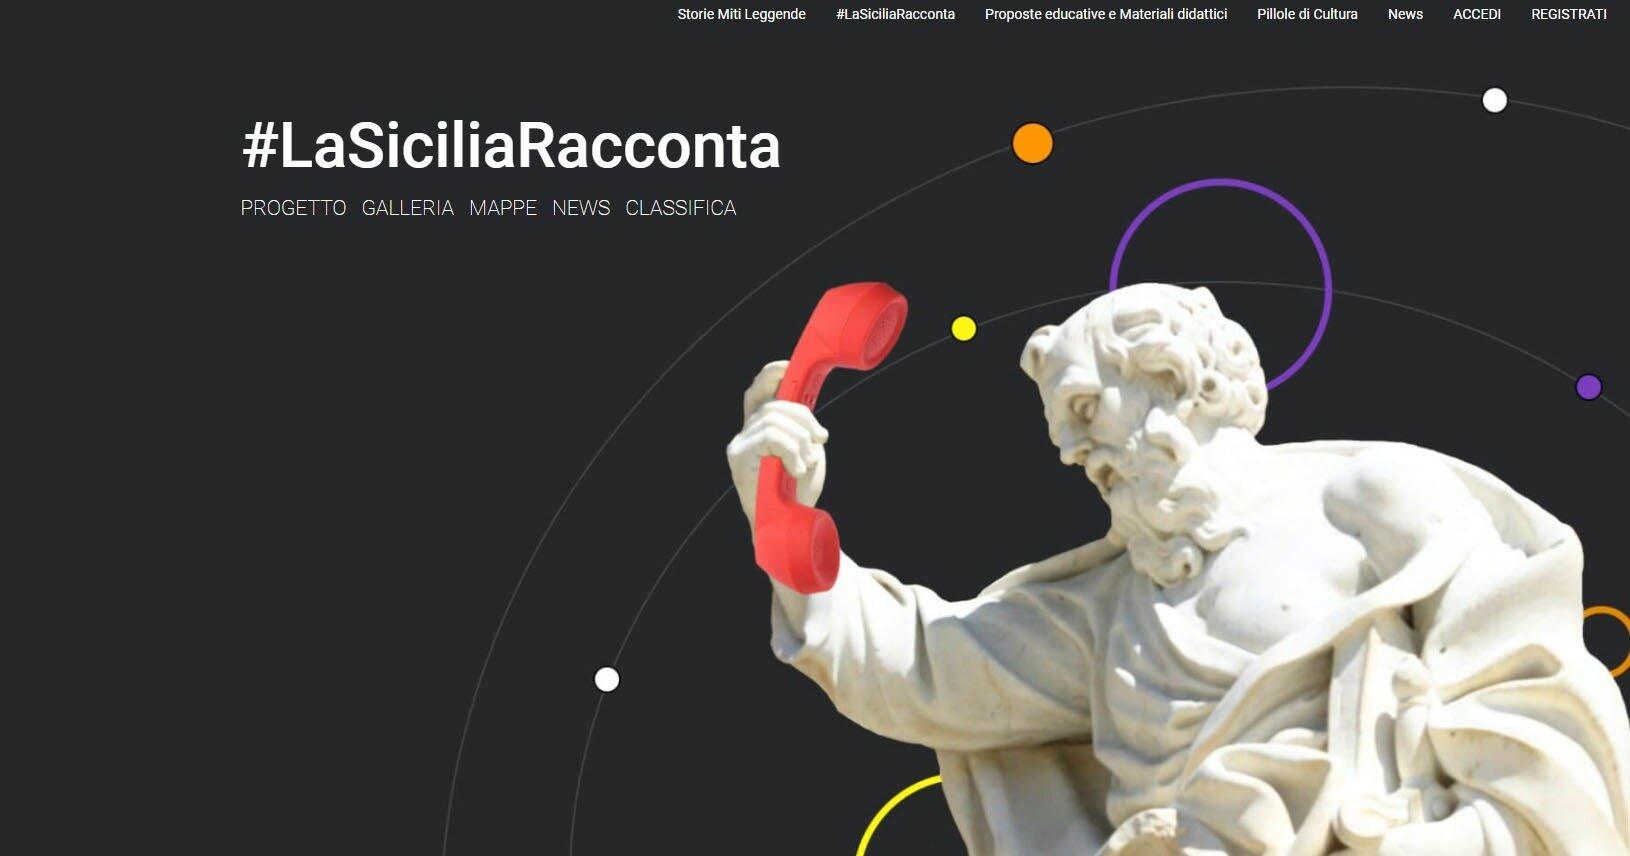 lasiciliaracconta-1612953458.jpg